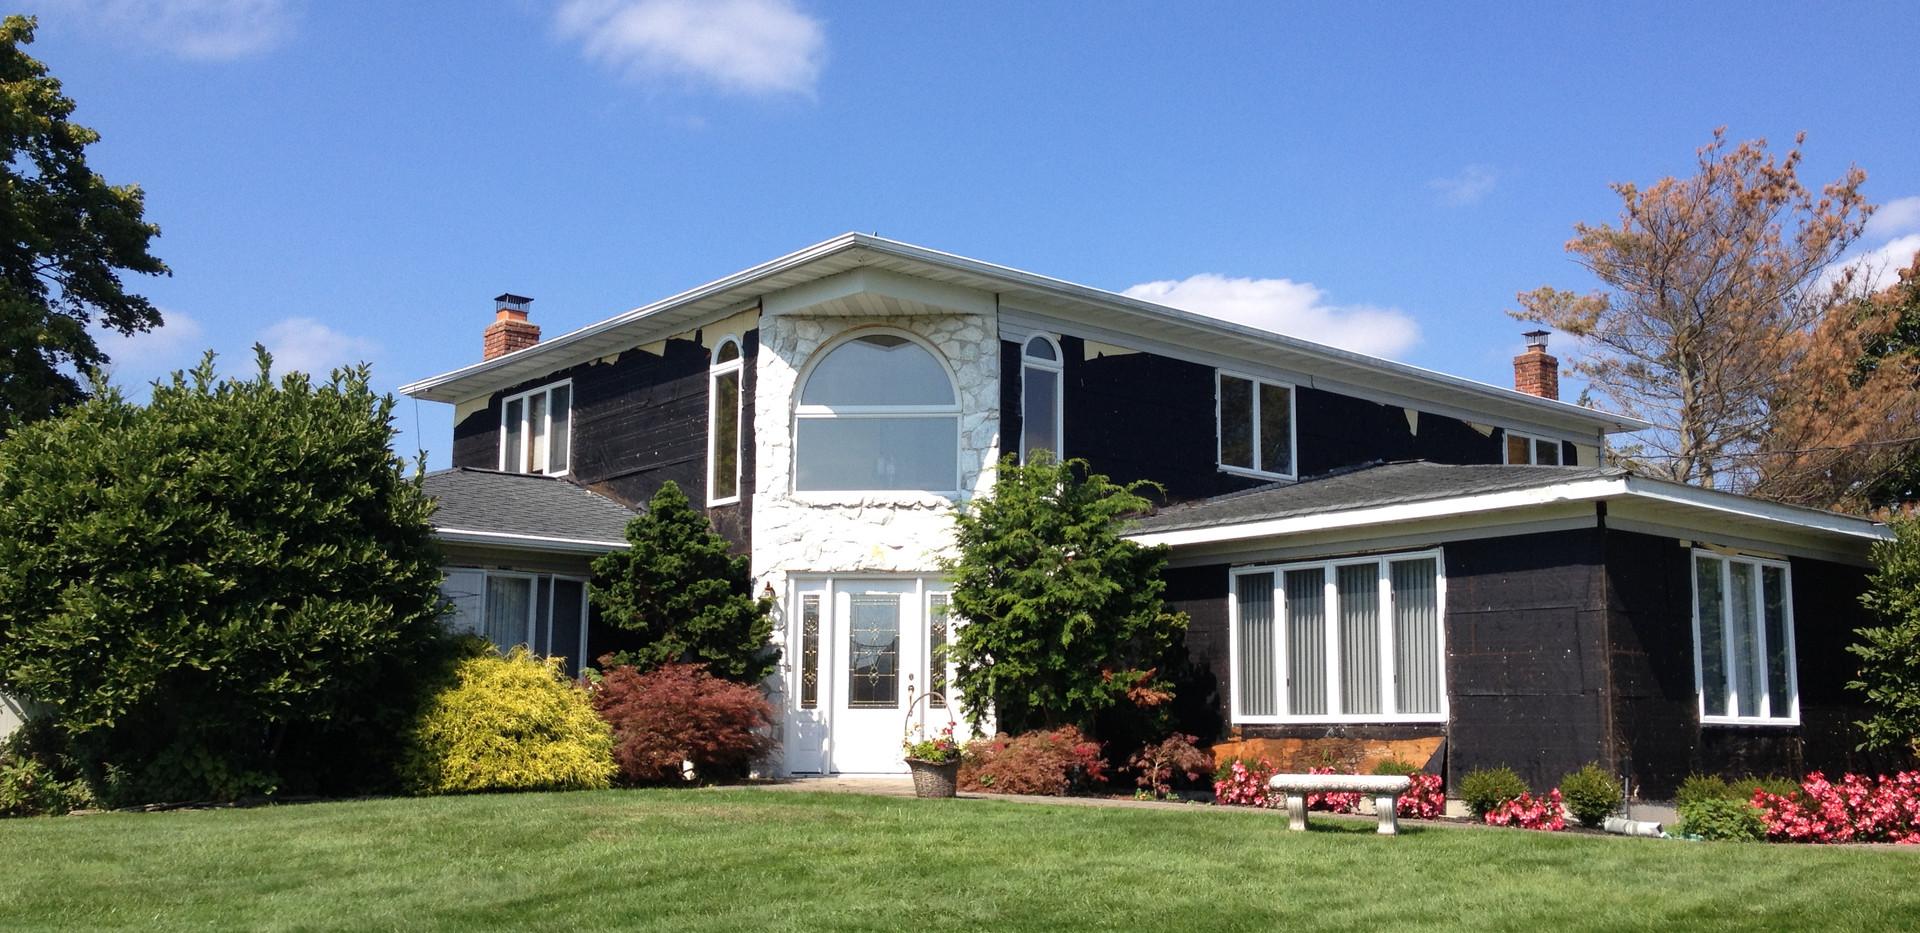 Bayport Windows & Siding